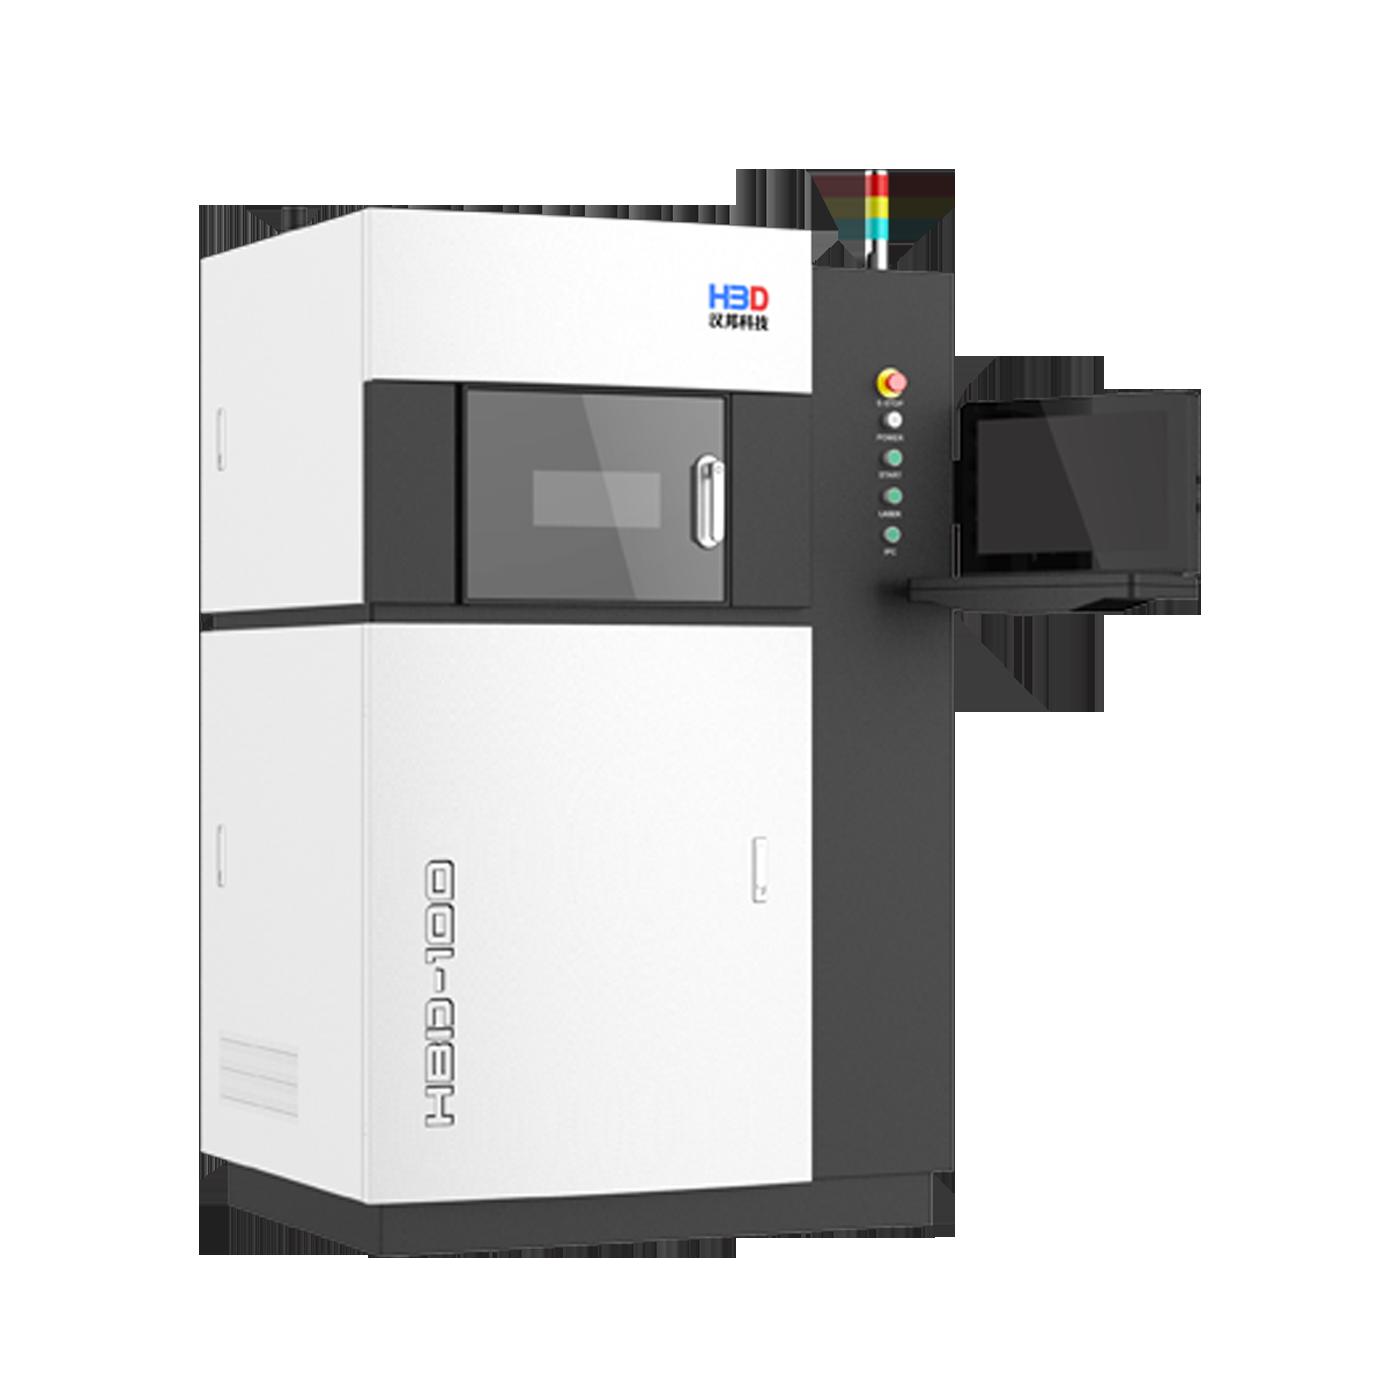 HBD-100 SLM 3D PRINTER